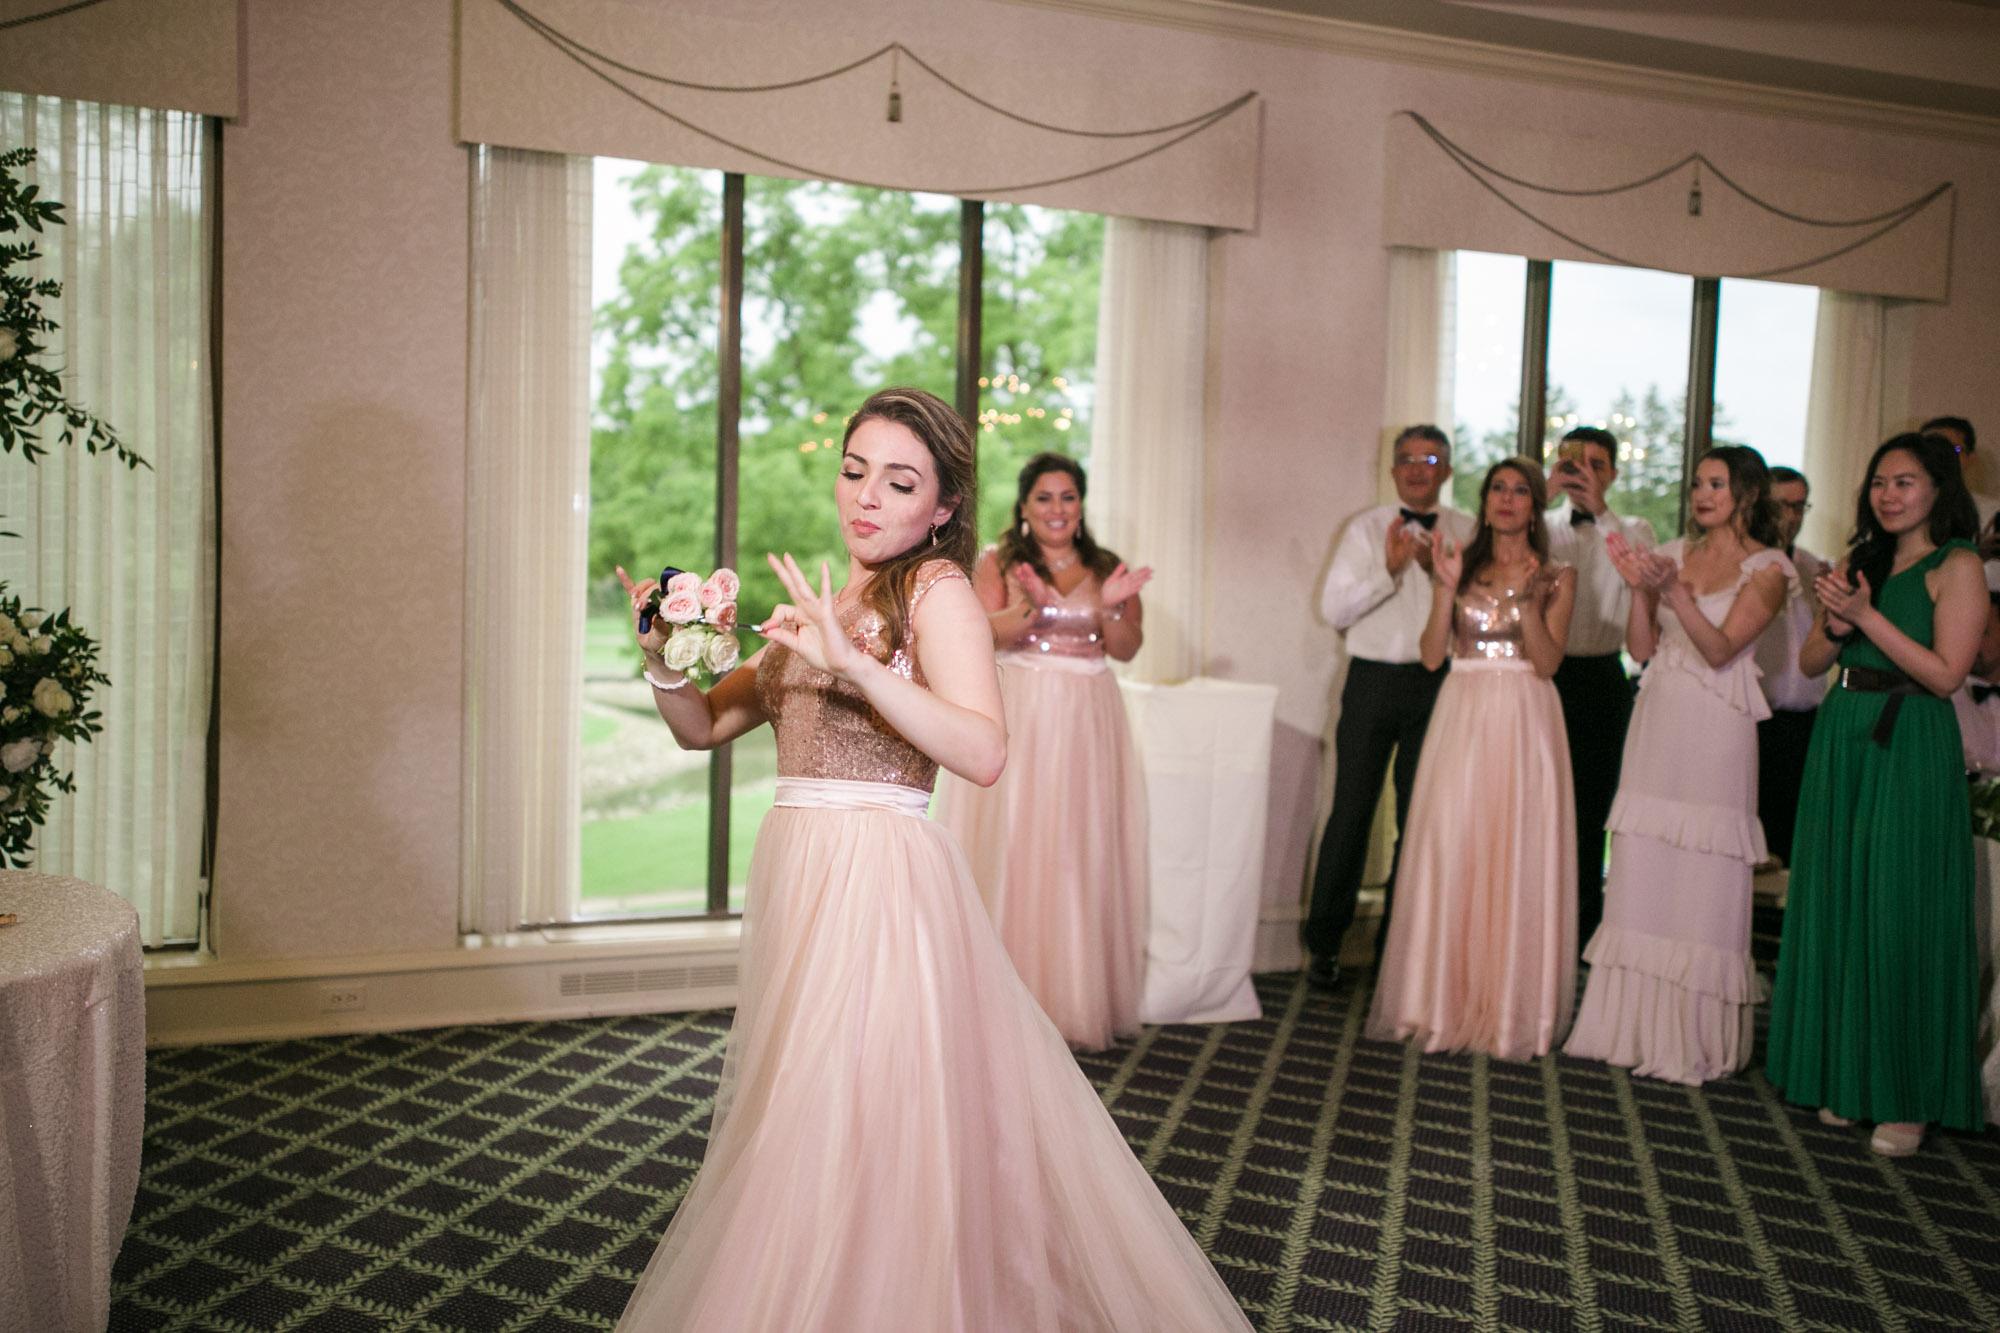 sylvania-country-club-wedding-photos-155.jpg